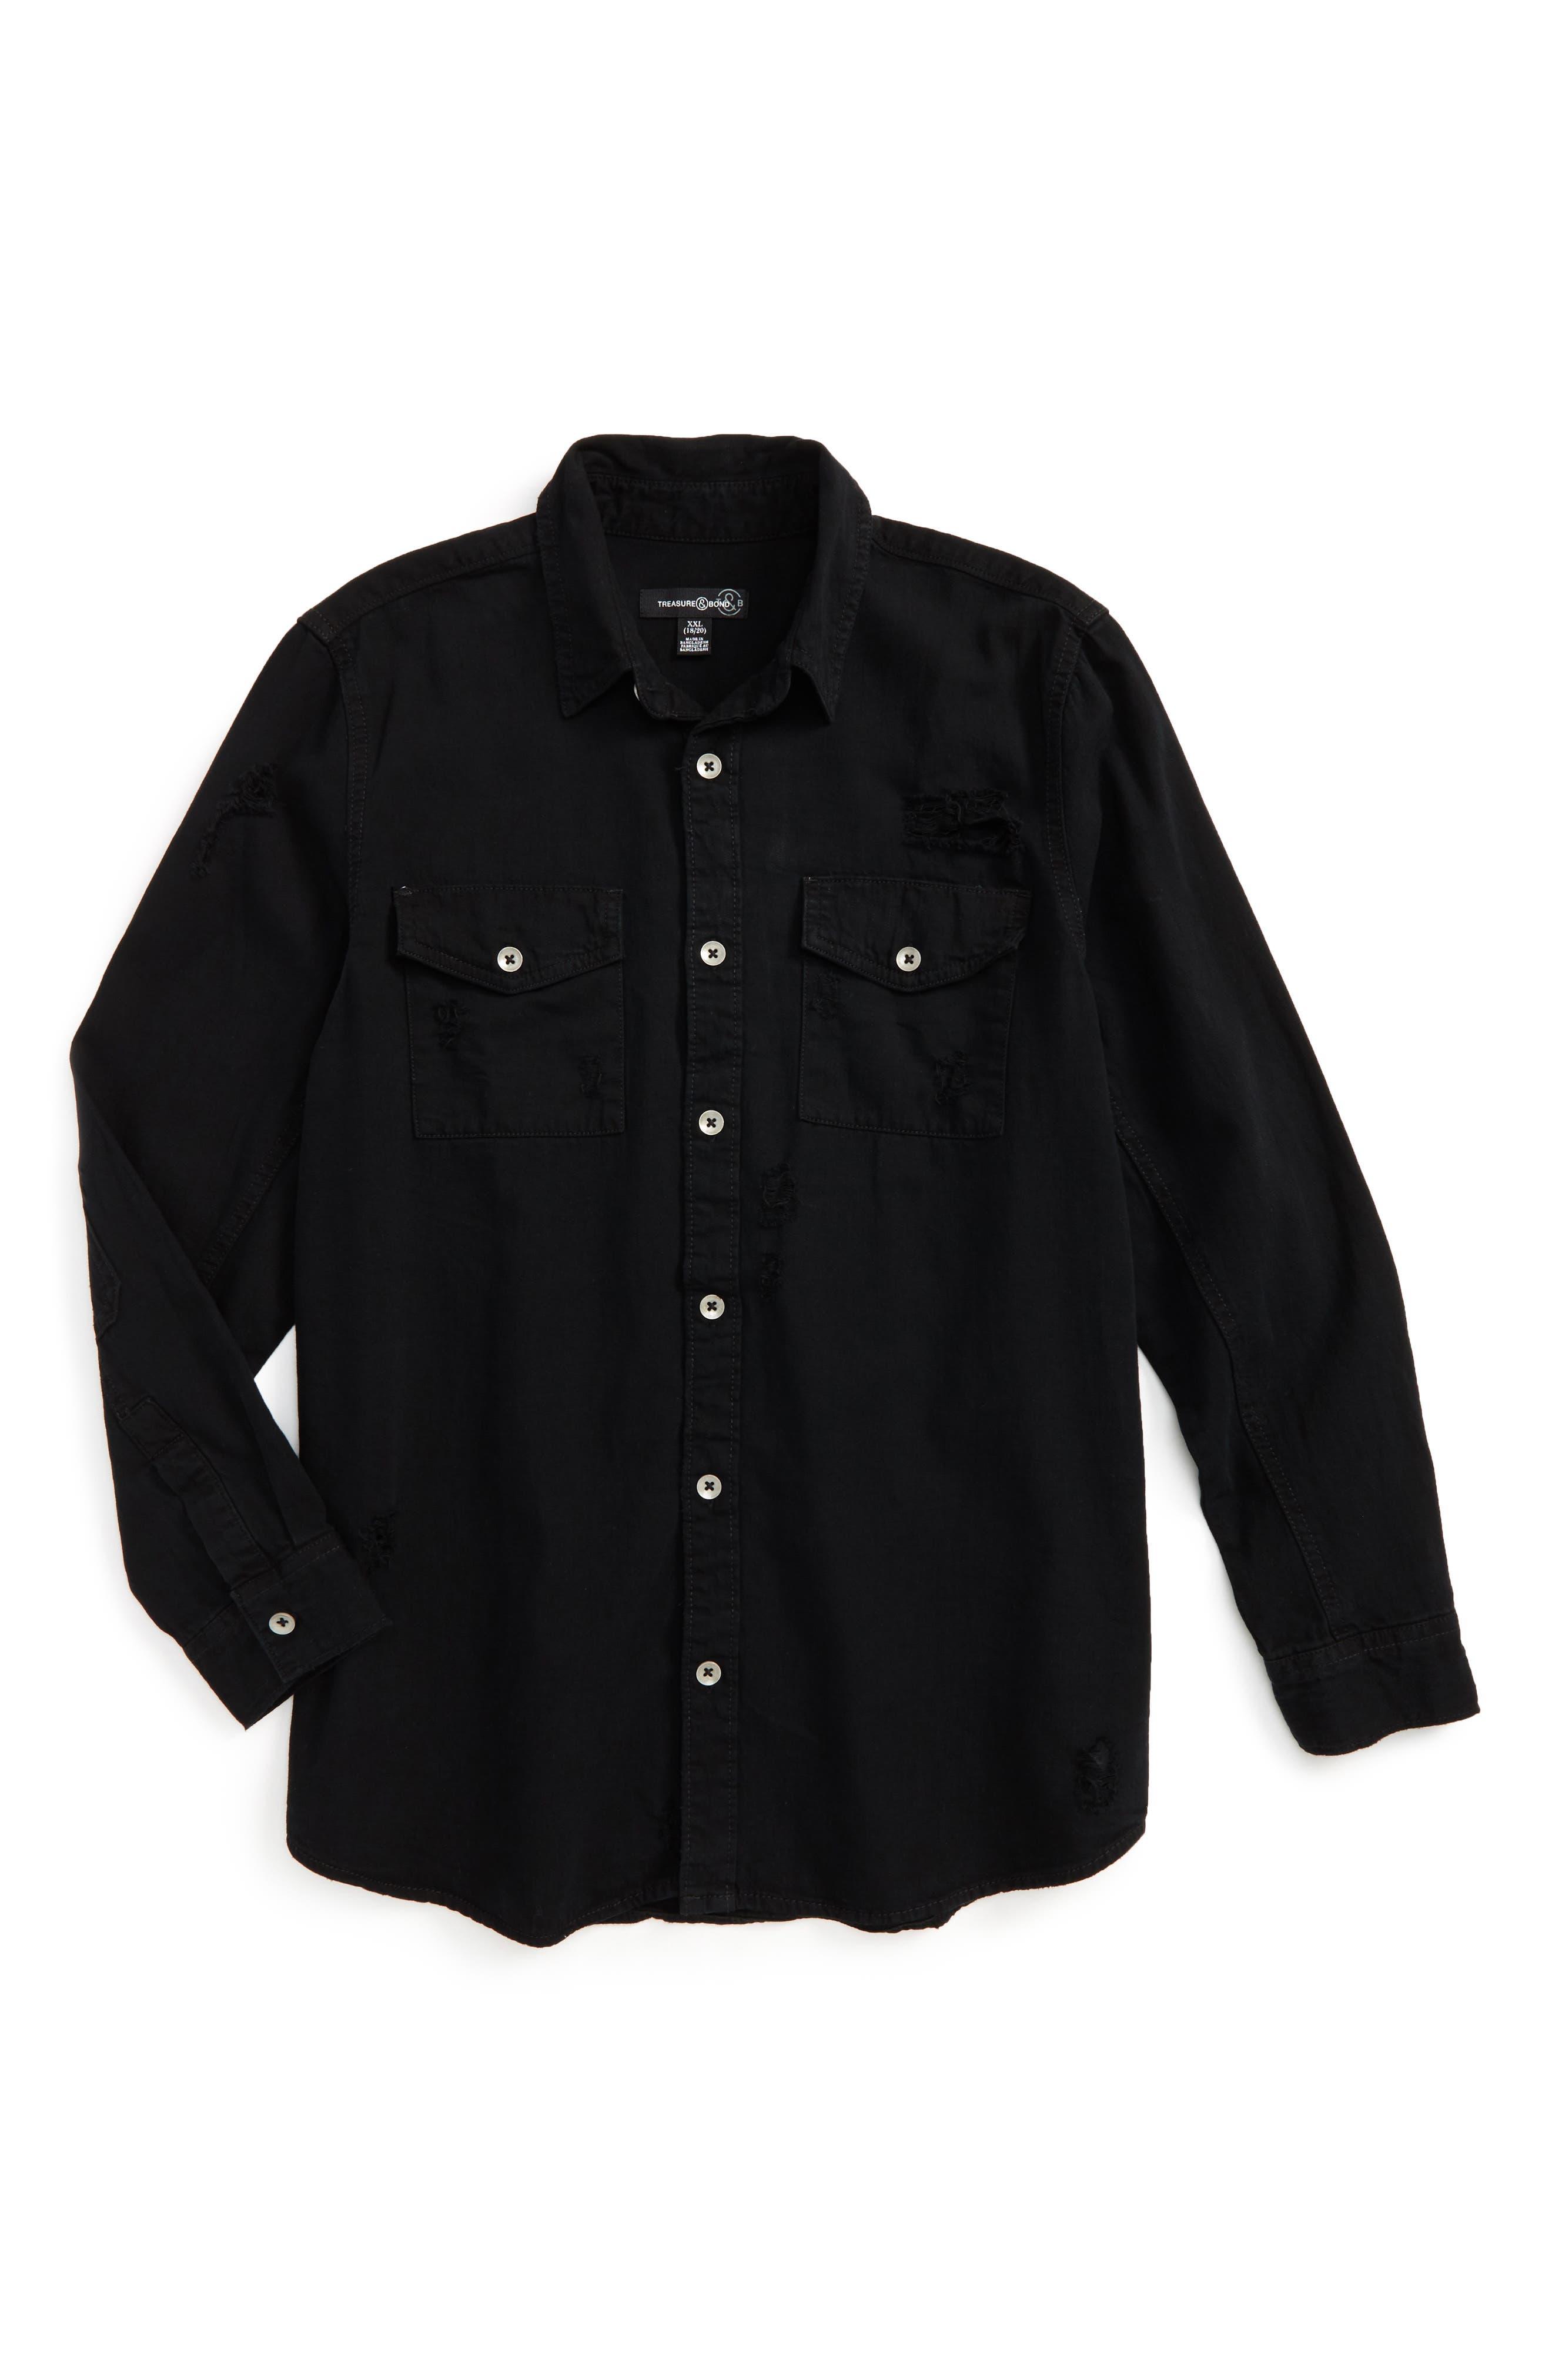 Main Image - Treasure & Bond Distressed Woven Shirt (Big Boys)